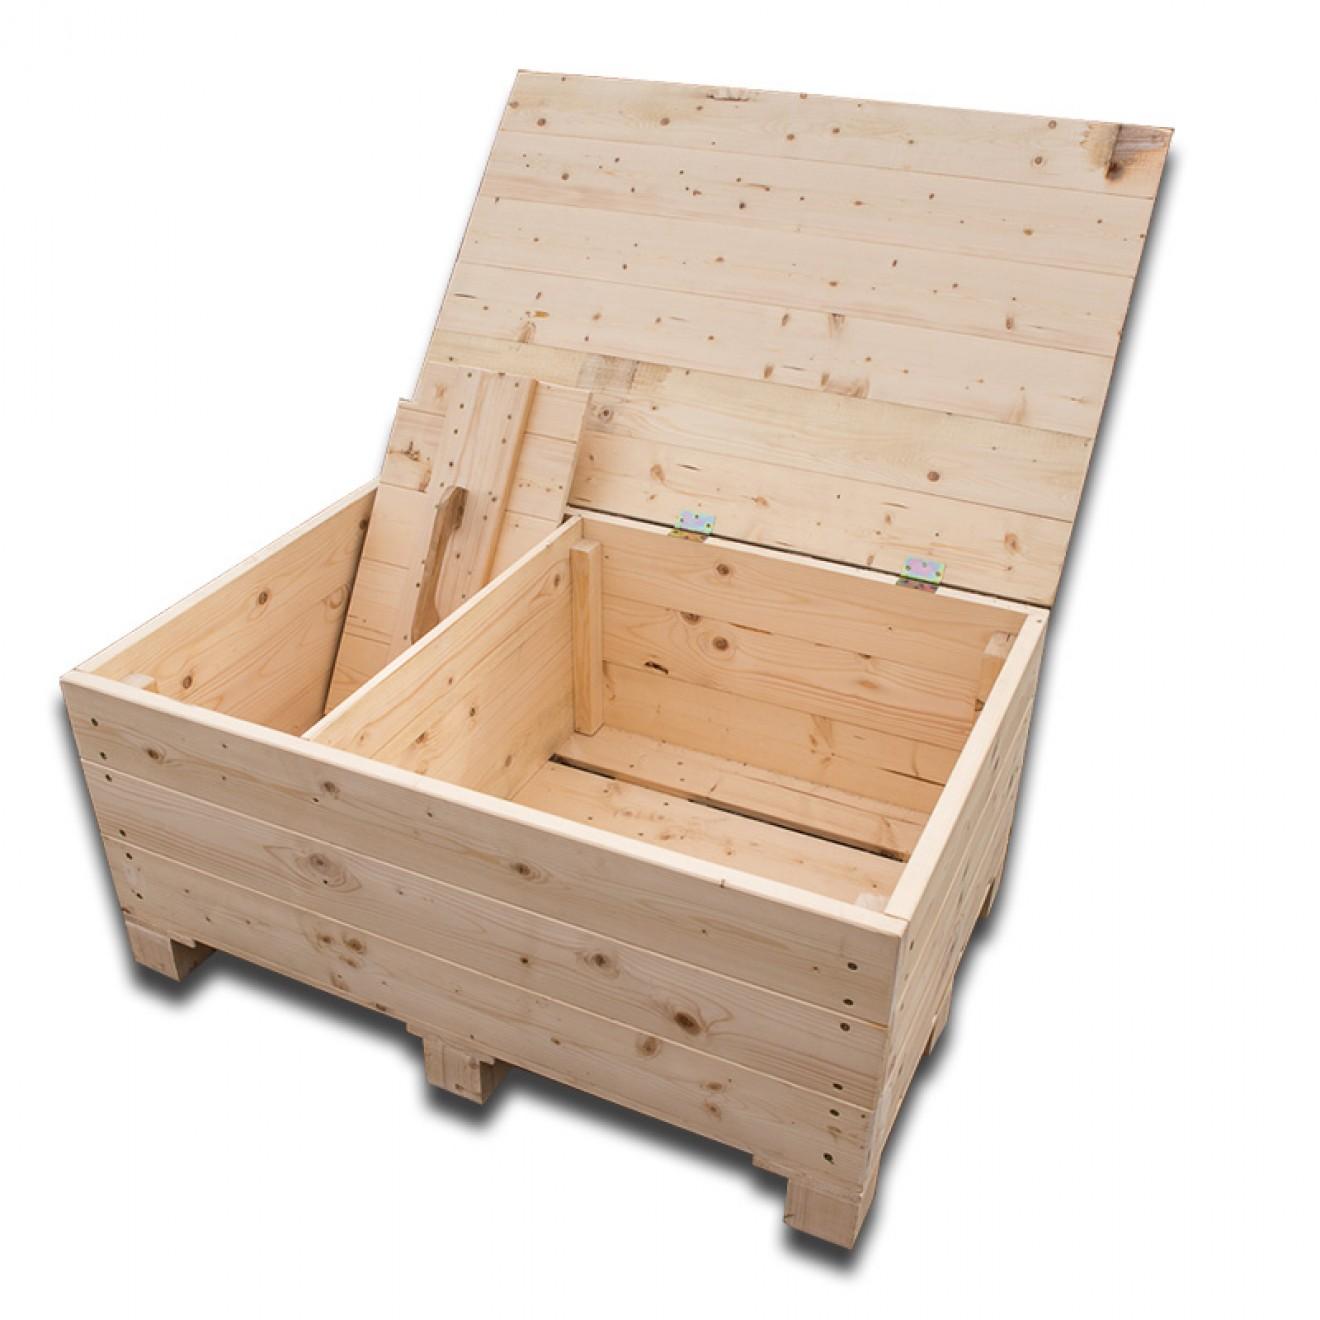 hotbox wormbox der komposter der next generation. Black Bedroom Furniture Sets. Home Design Ideas